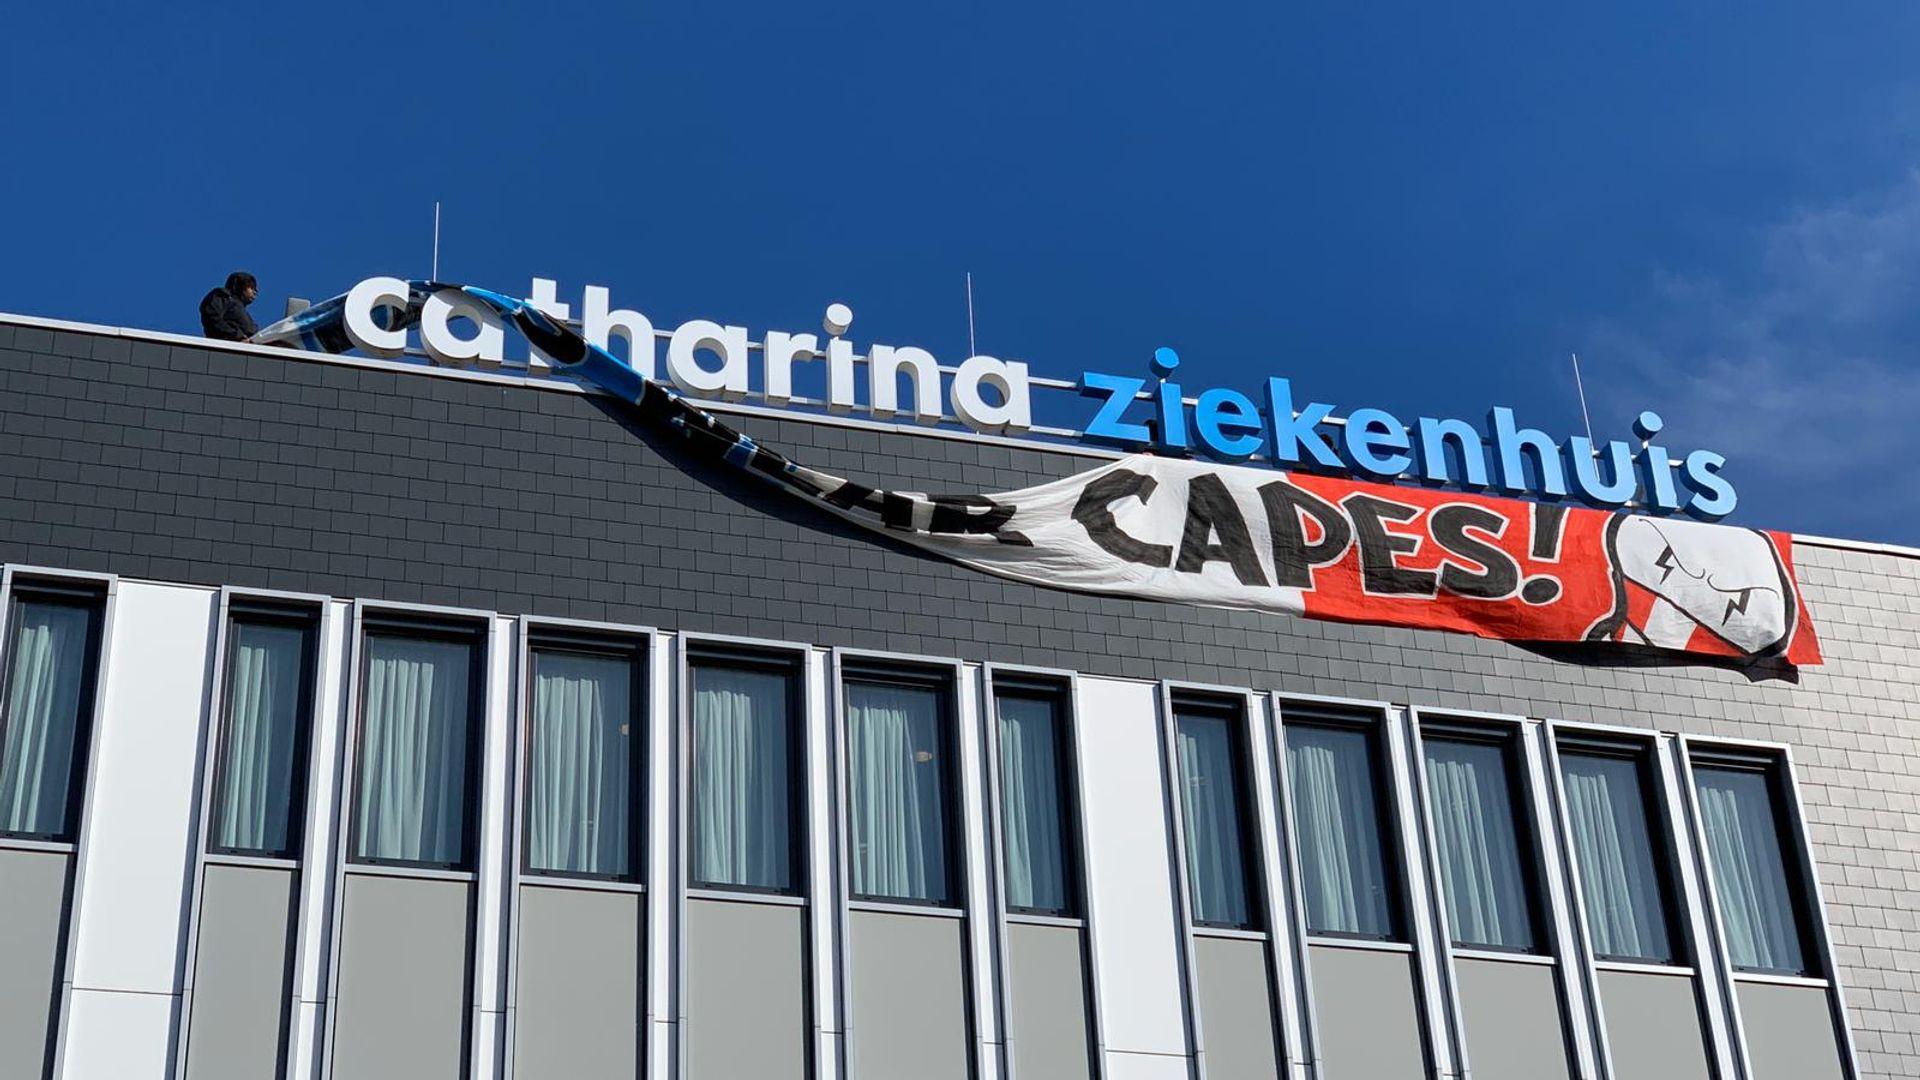 Spandoek PSV Catharina ziekenhuis